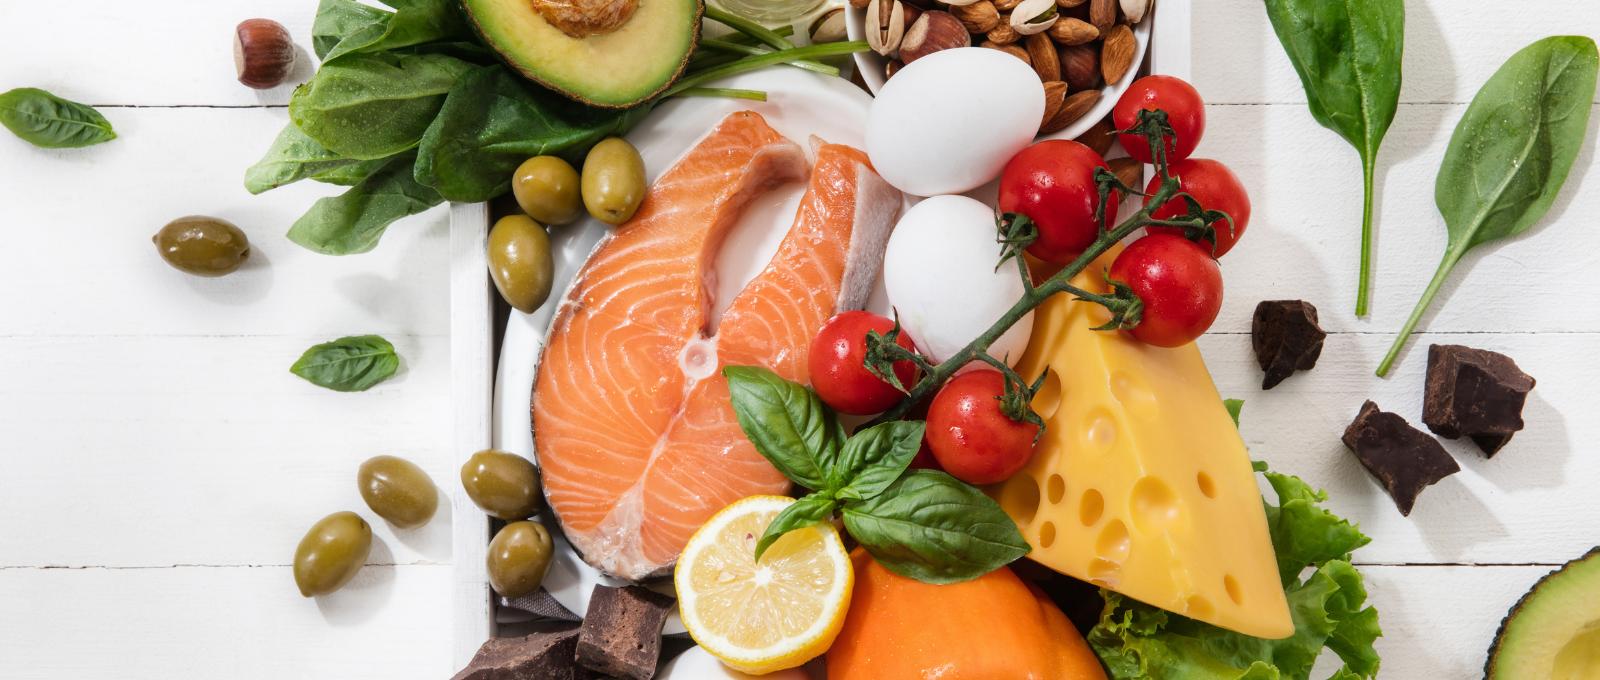 nourriture saine - restauration collective